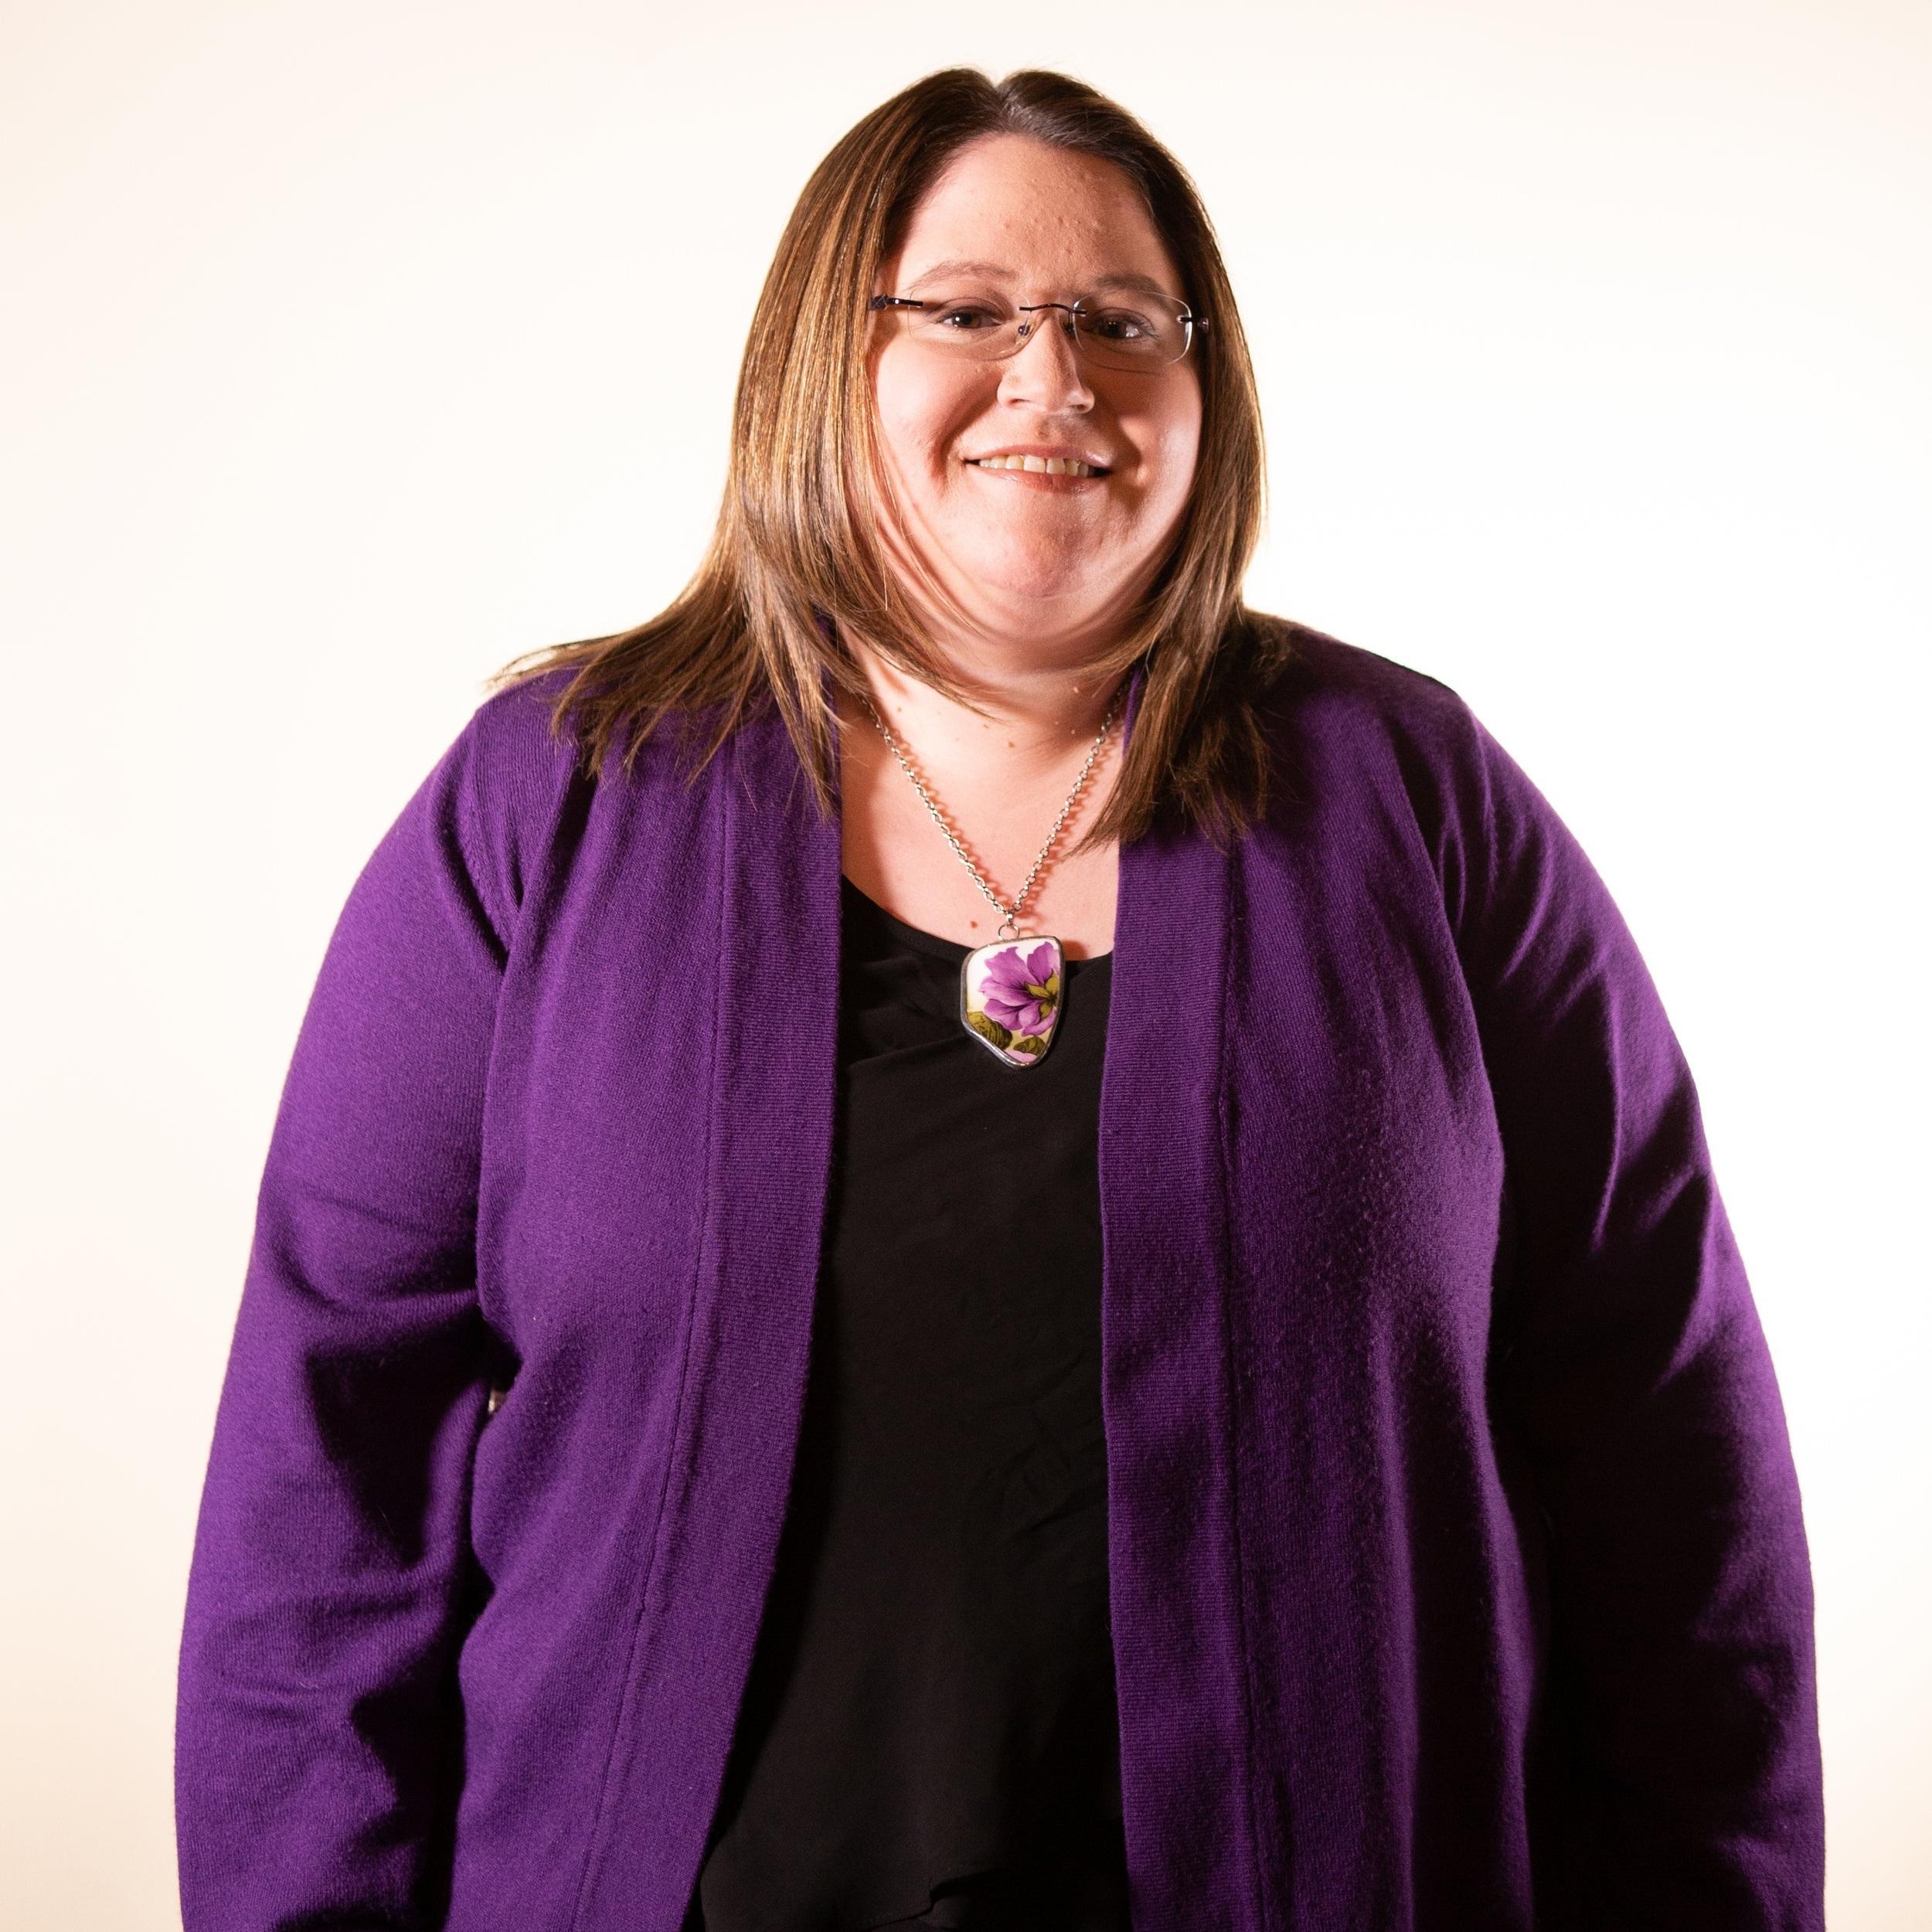 Ms. Leslie Gomes/Intermediate Algebra & College Algebra